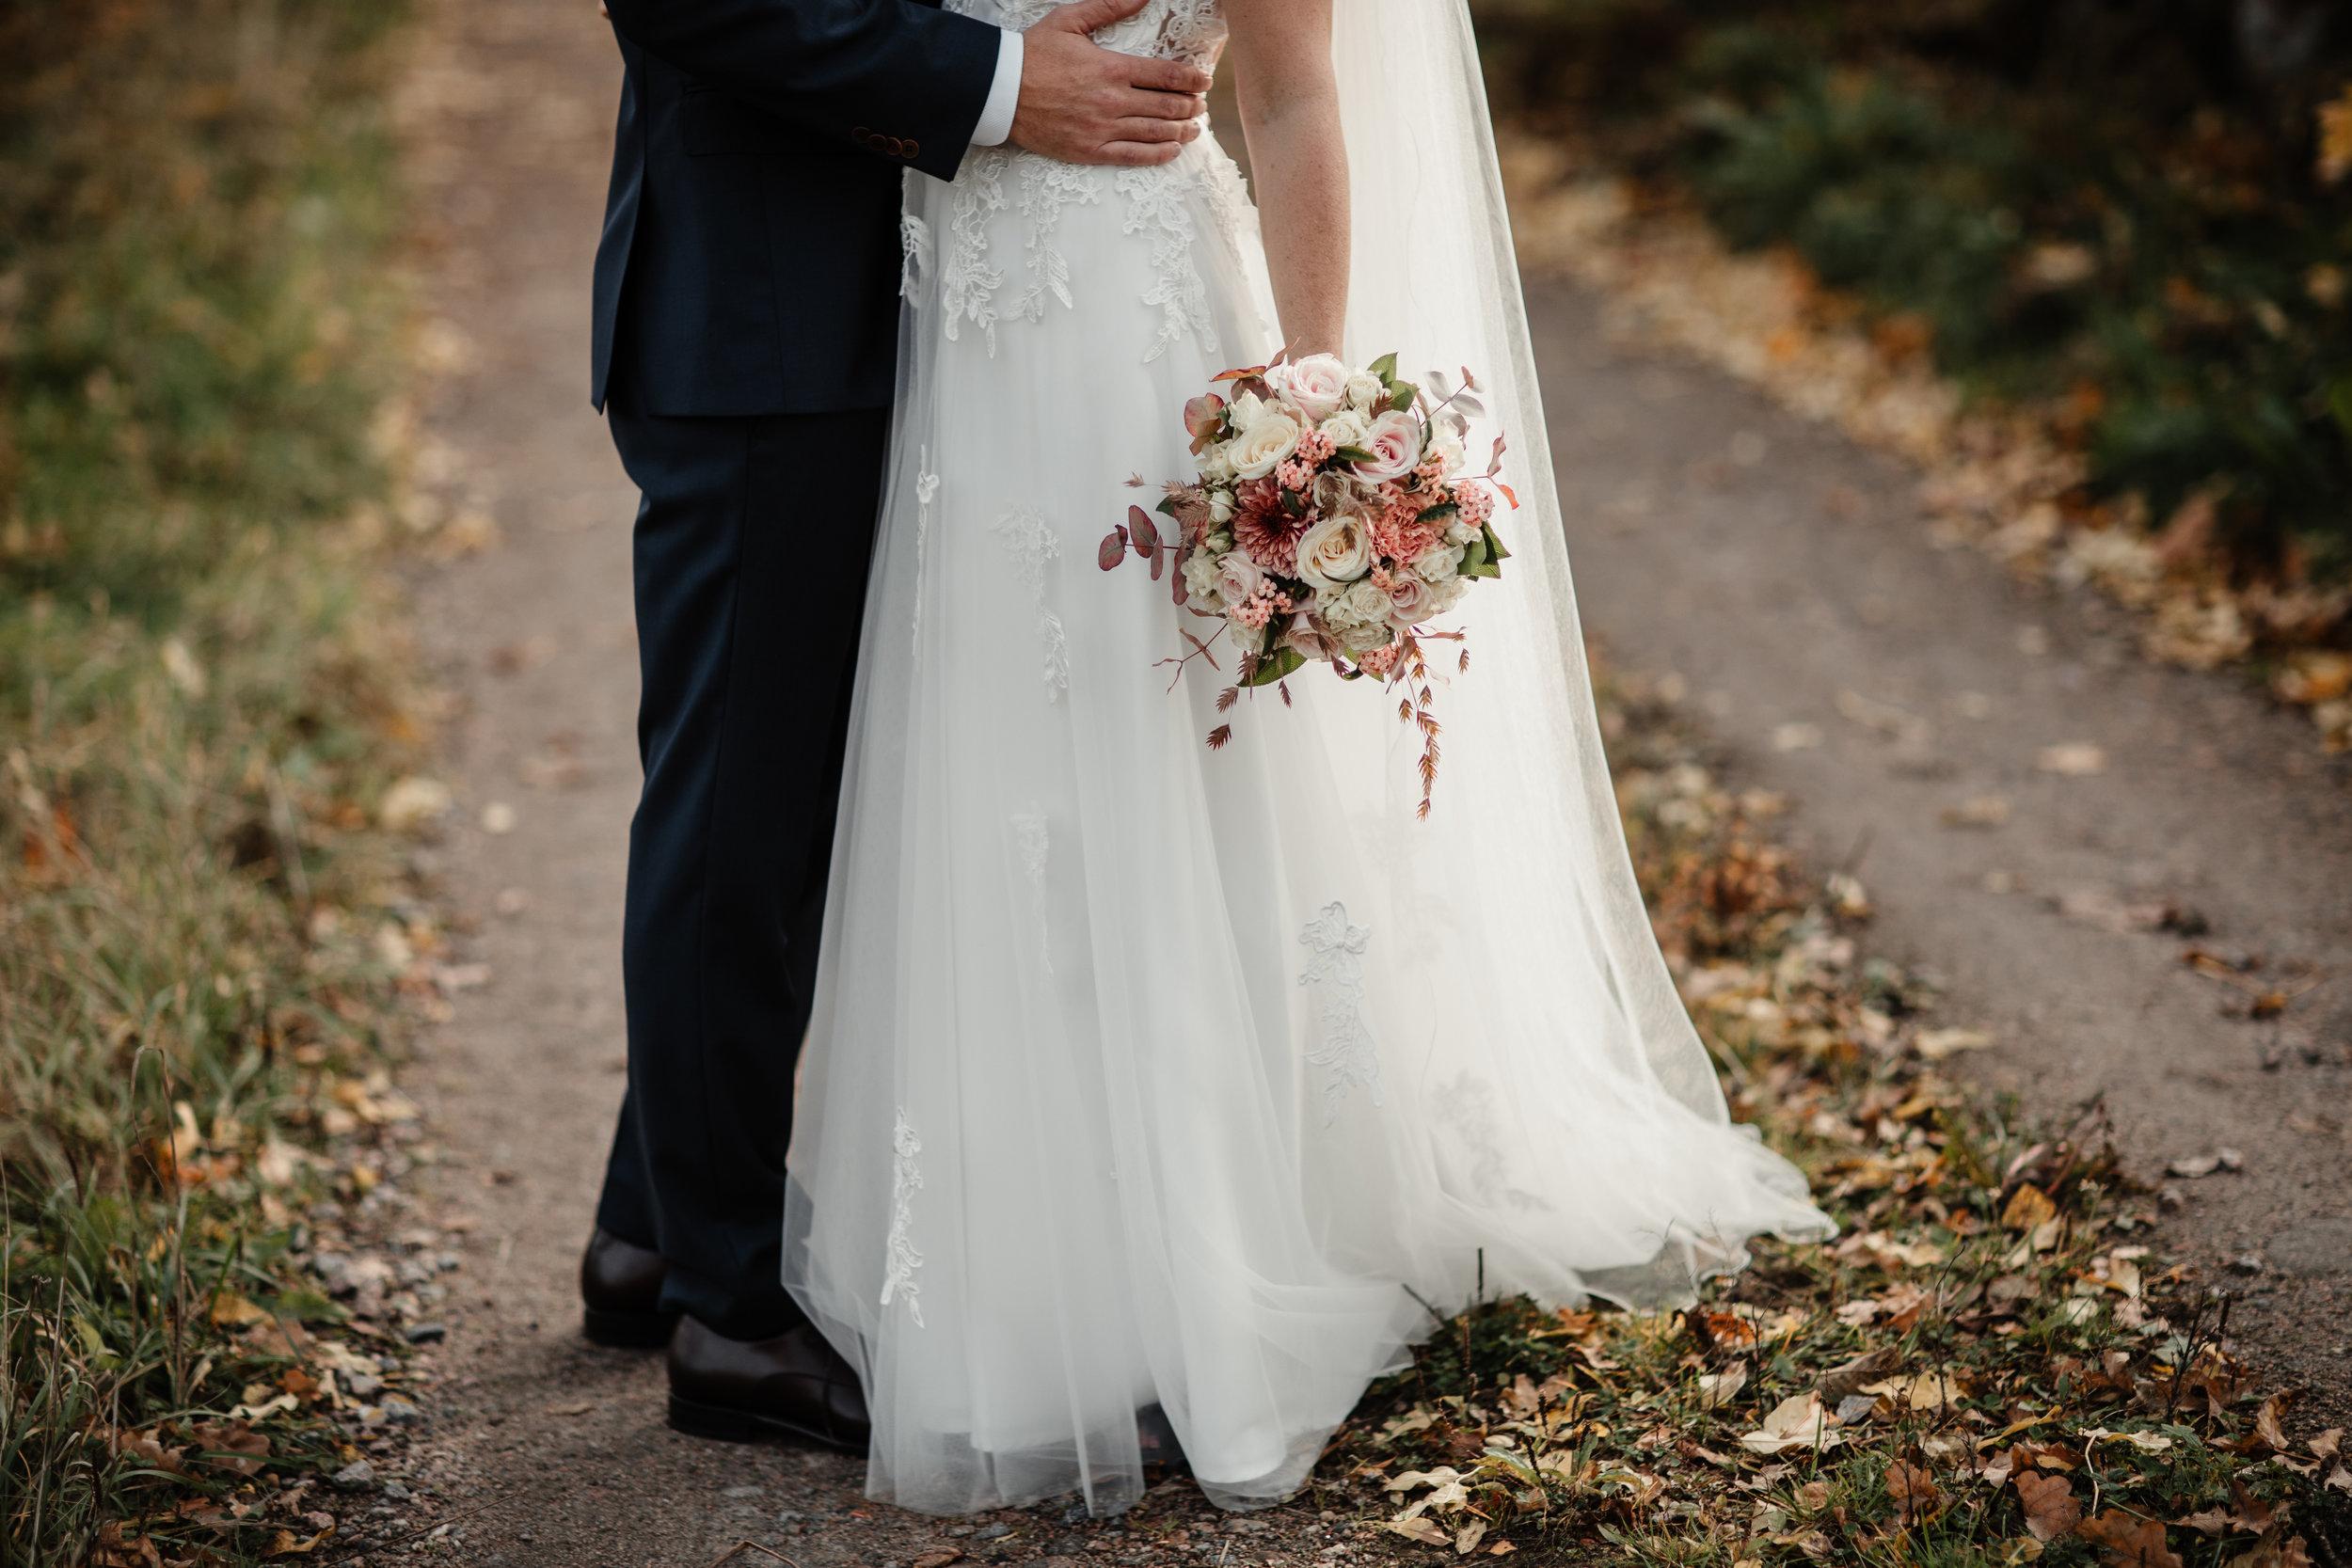 Bröllopsfotograf-Uddetorp Säteri-Höstbröllop-Fotograf Emilia- Bröllopsfotograf Borås-20.jpg